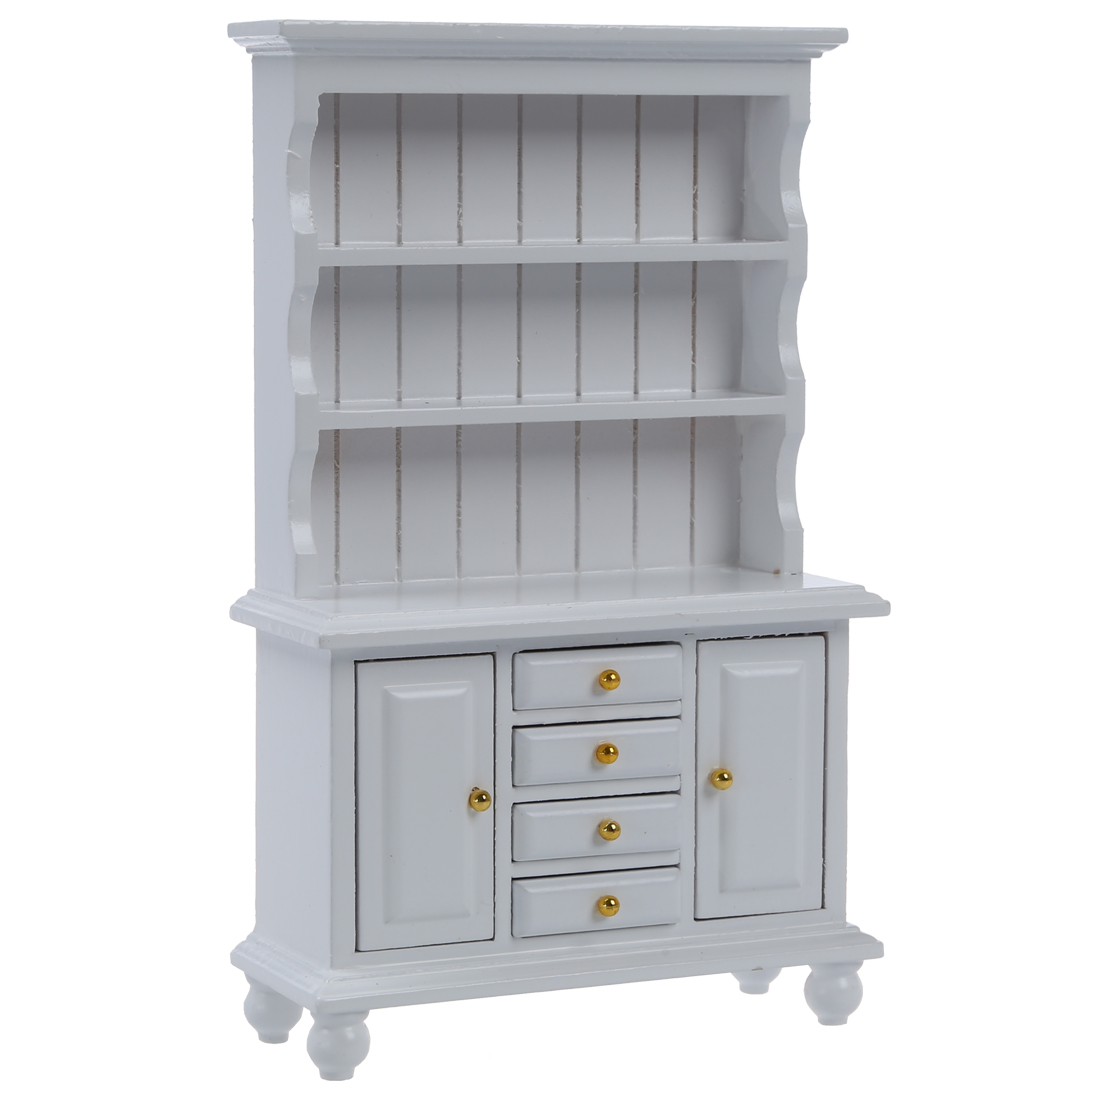 1//12 White Wooden Bookcase Cabinet Shelf for Dollhouse Miniature Furniture